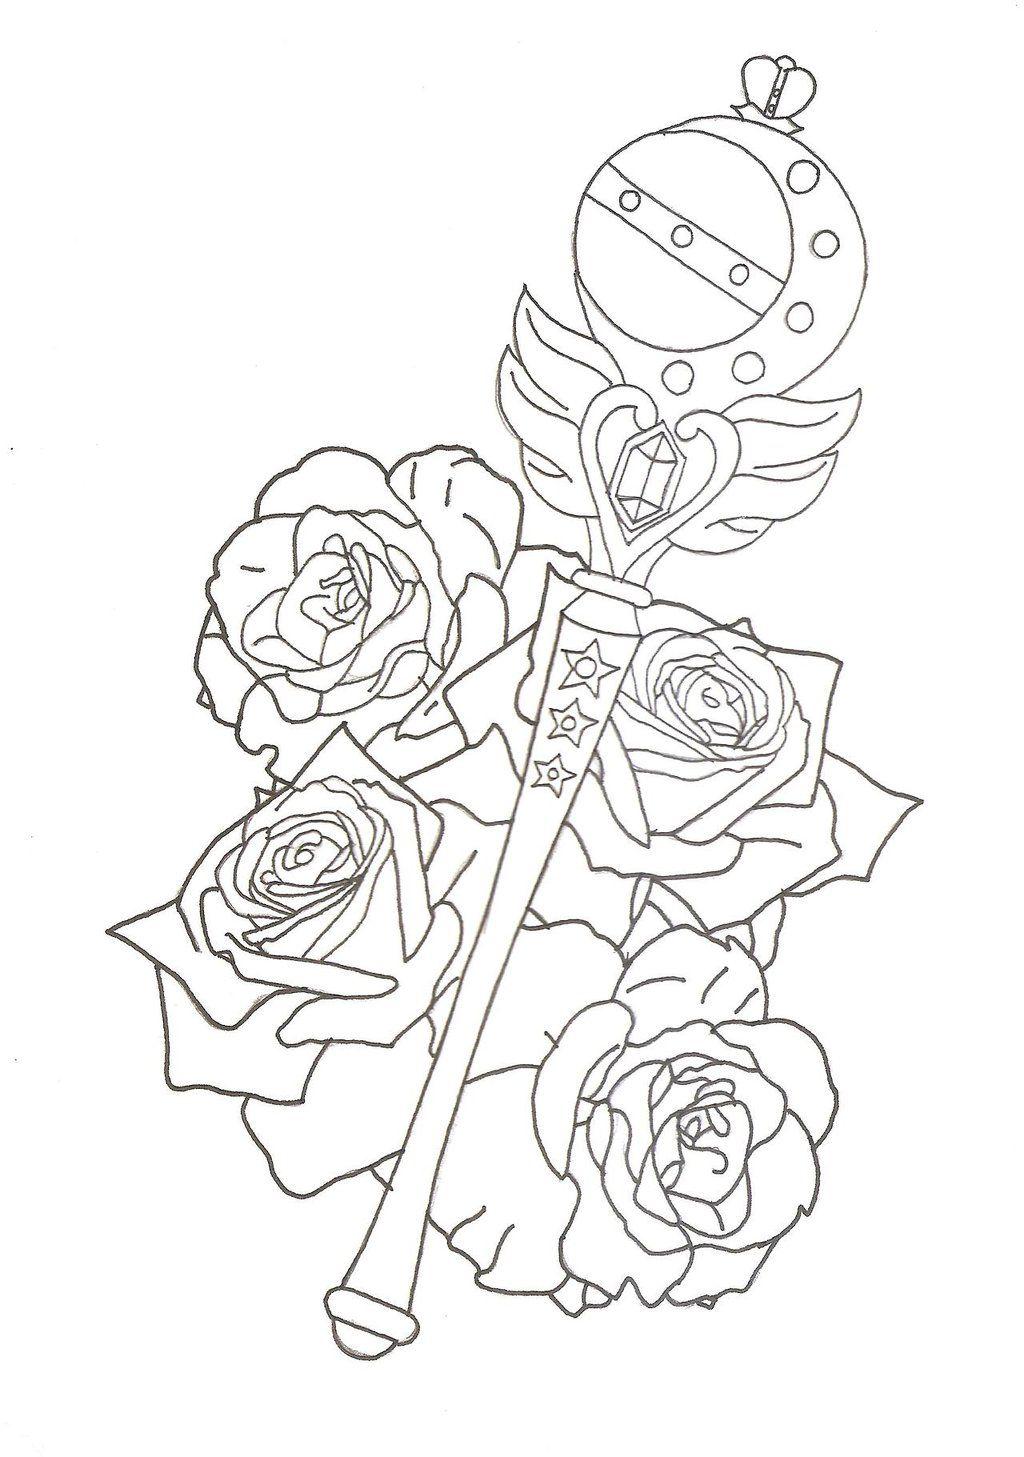 Sailor Moon Cutie Moon Rod Tattoo Design by